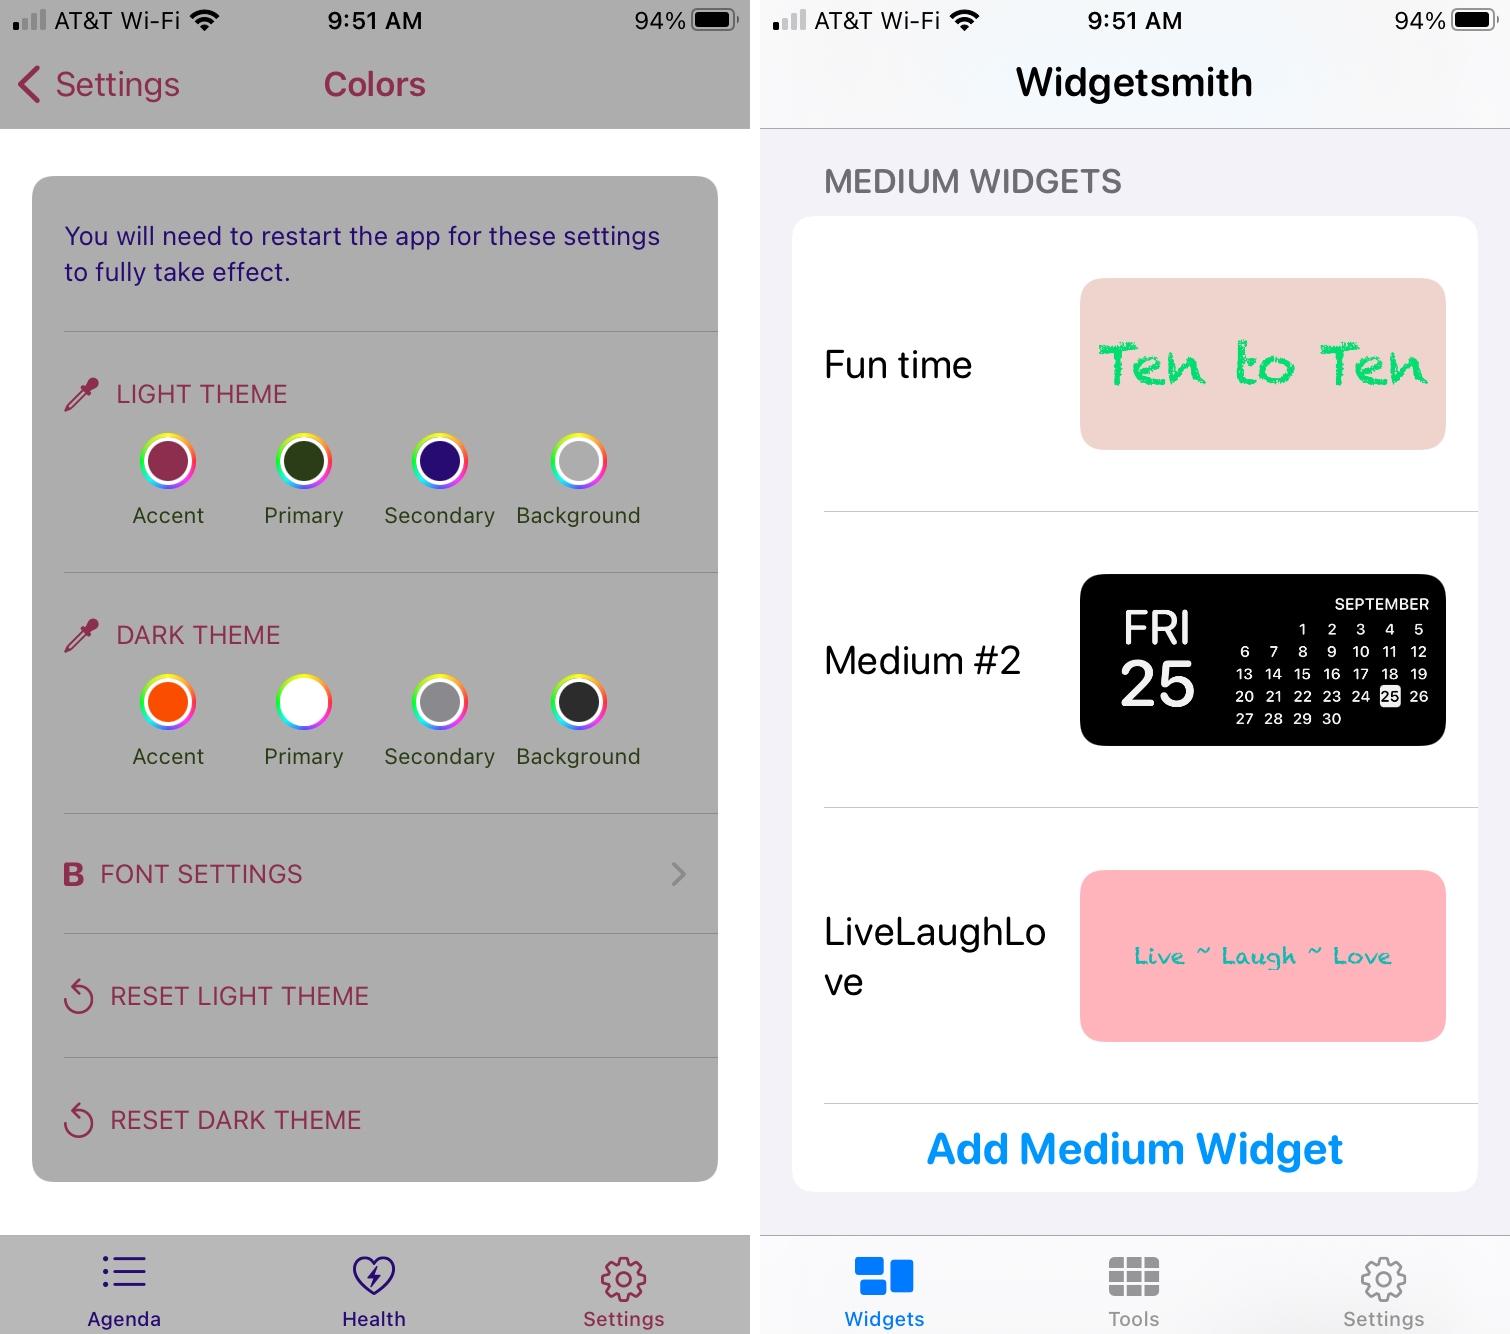 Widget Wizard and Widgetsmith on iPhone